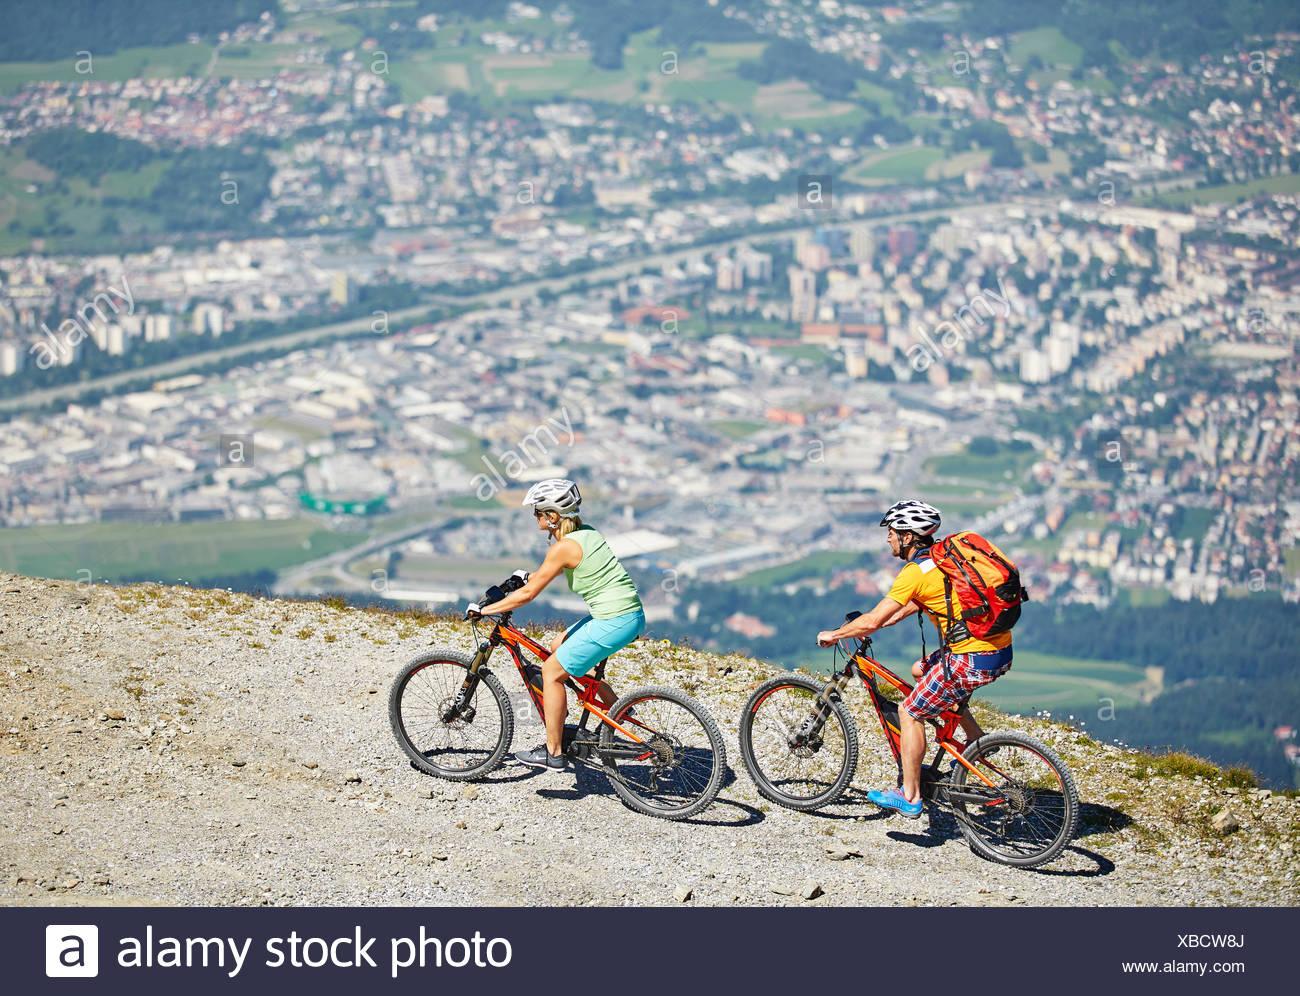 Man 40-45 years and woman 35-40 years with helmets cycle with their mountain bikes, Zirbenweg, Patscherkofel, Innsbruck, Tyrol Stock Photo